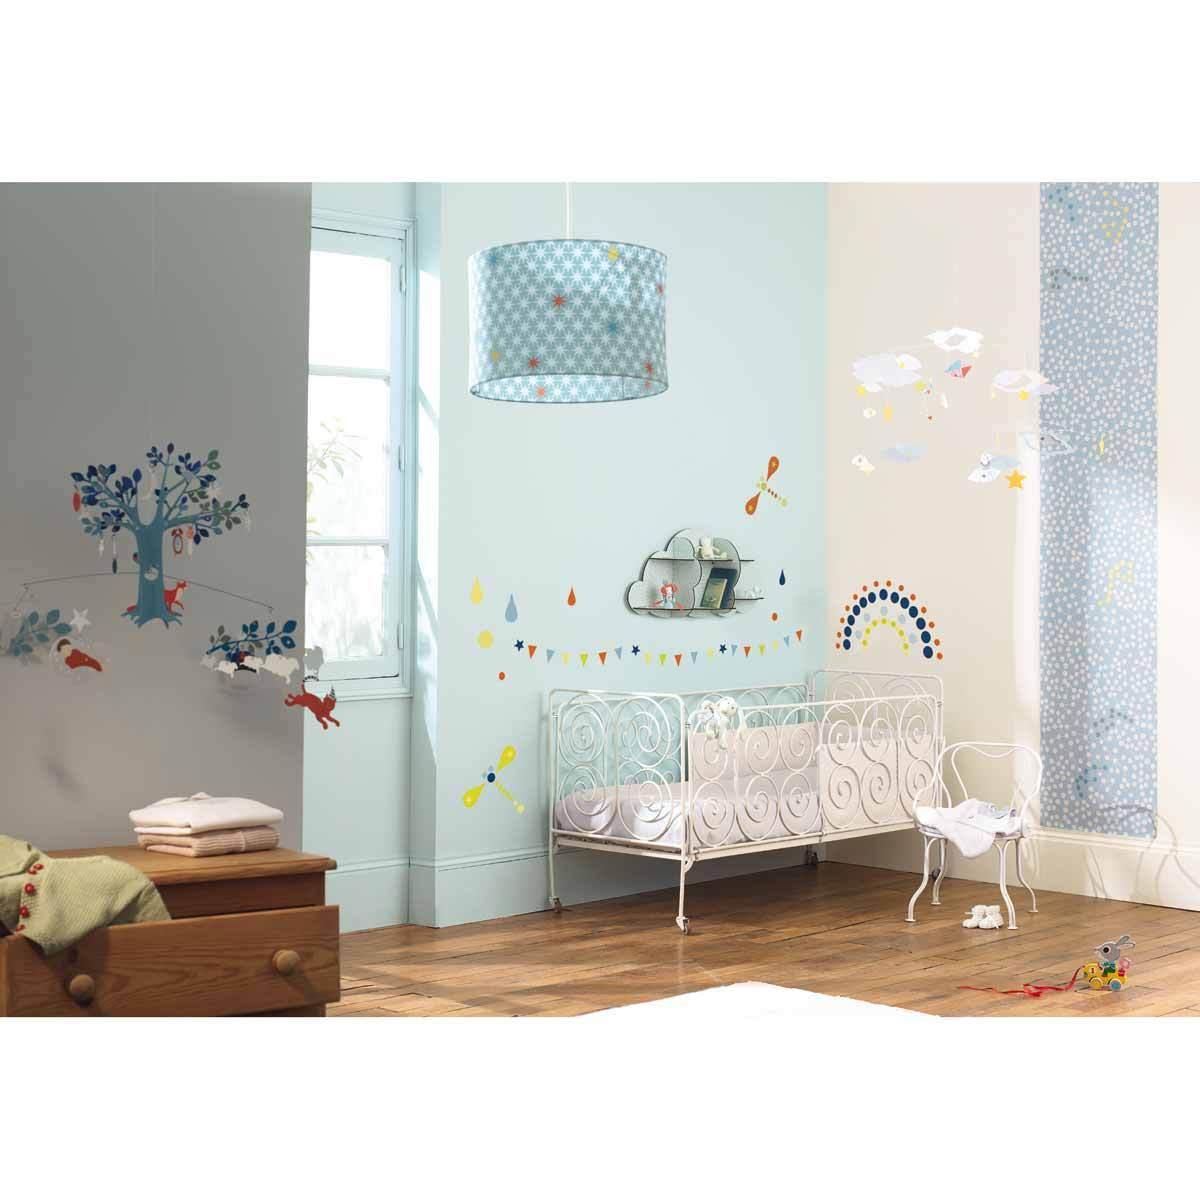 little big room stickers muraux petits pois c leste. Black Bedroom Furniture Sets. Home Design Ideas